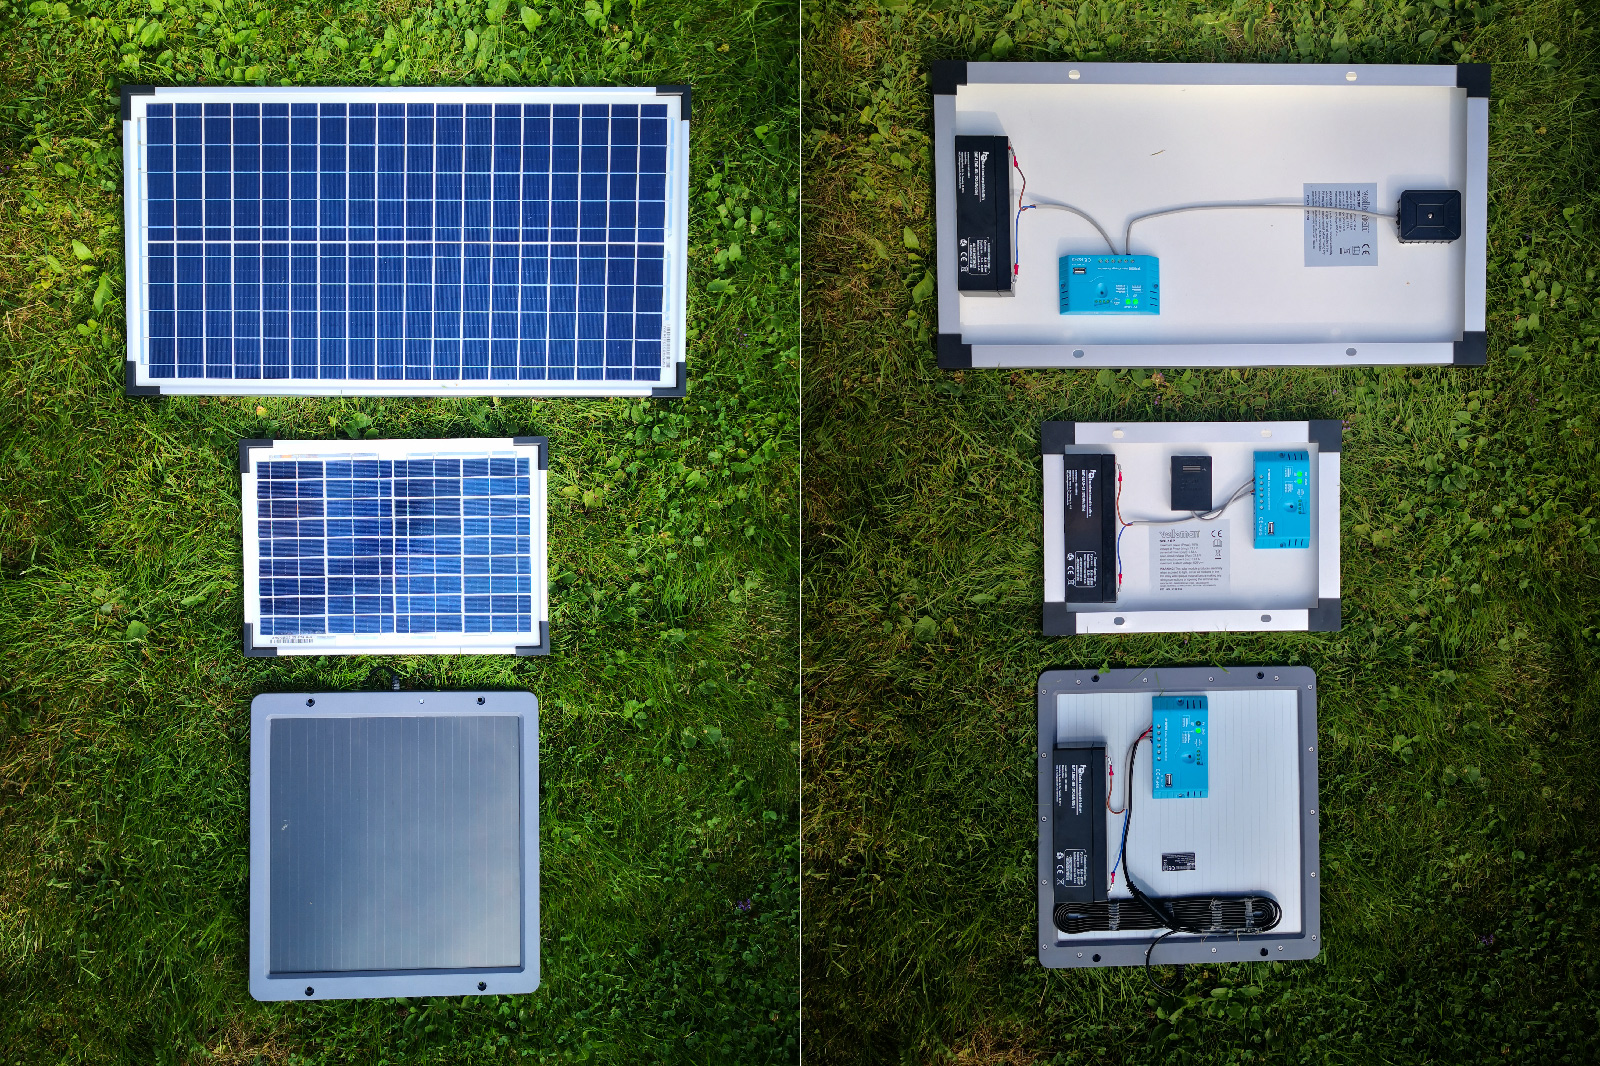 Solar panel setups